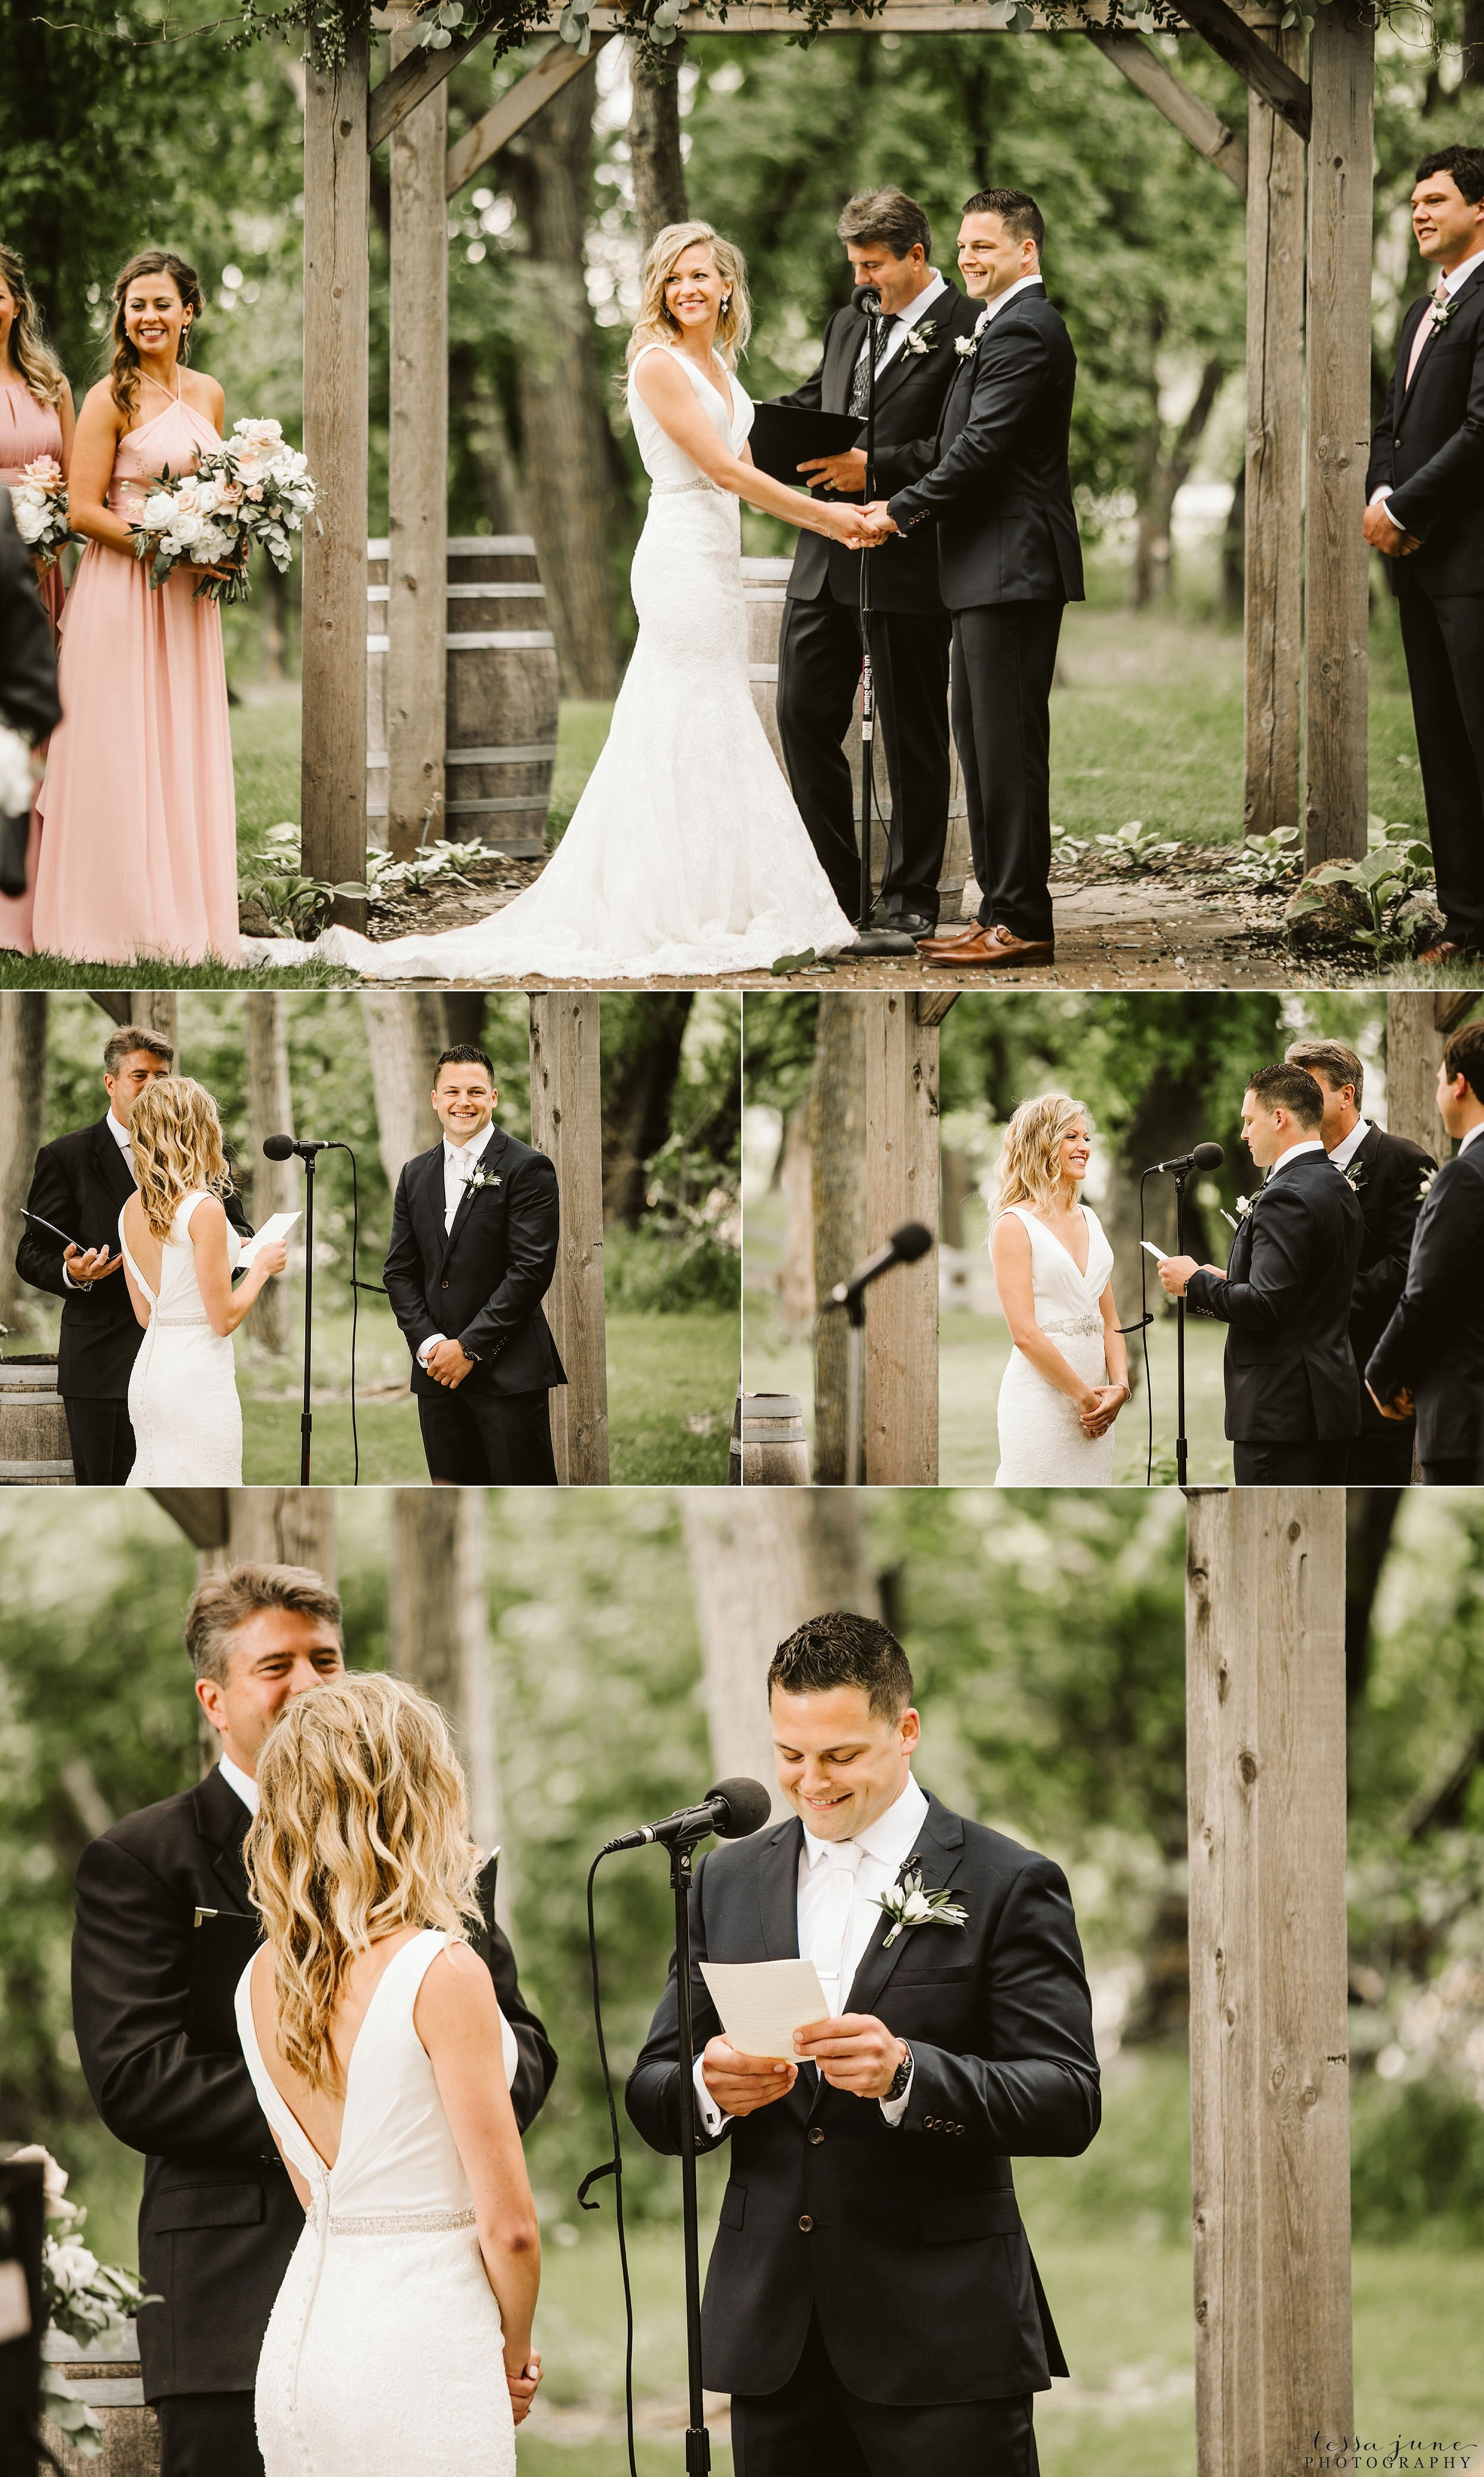 carlos-creek-winery-wedding-summer-pristine-floral-blush-pink-navy-alexandria-minnesota-117.jpg